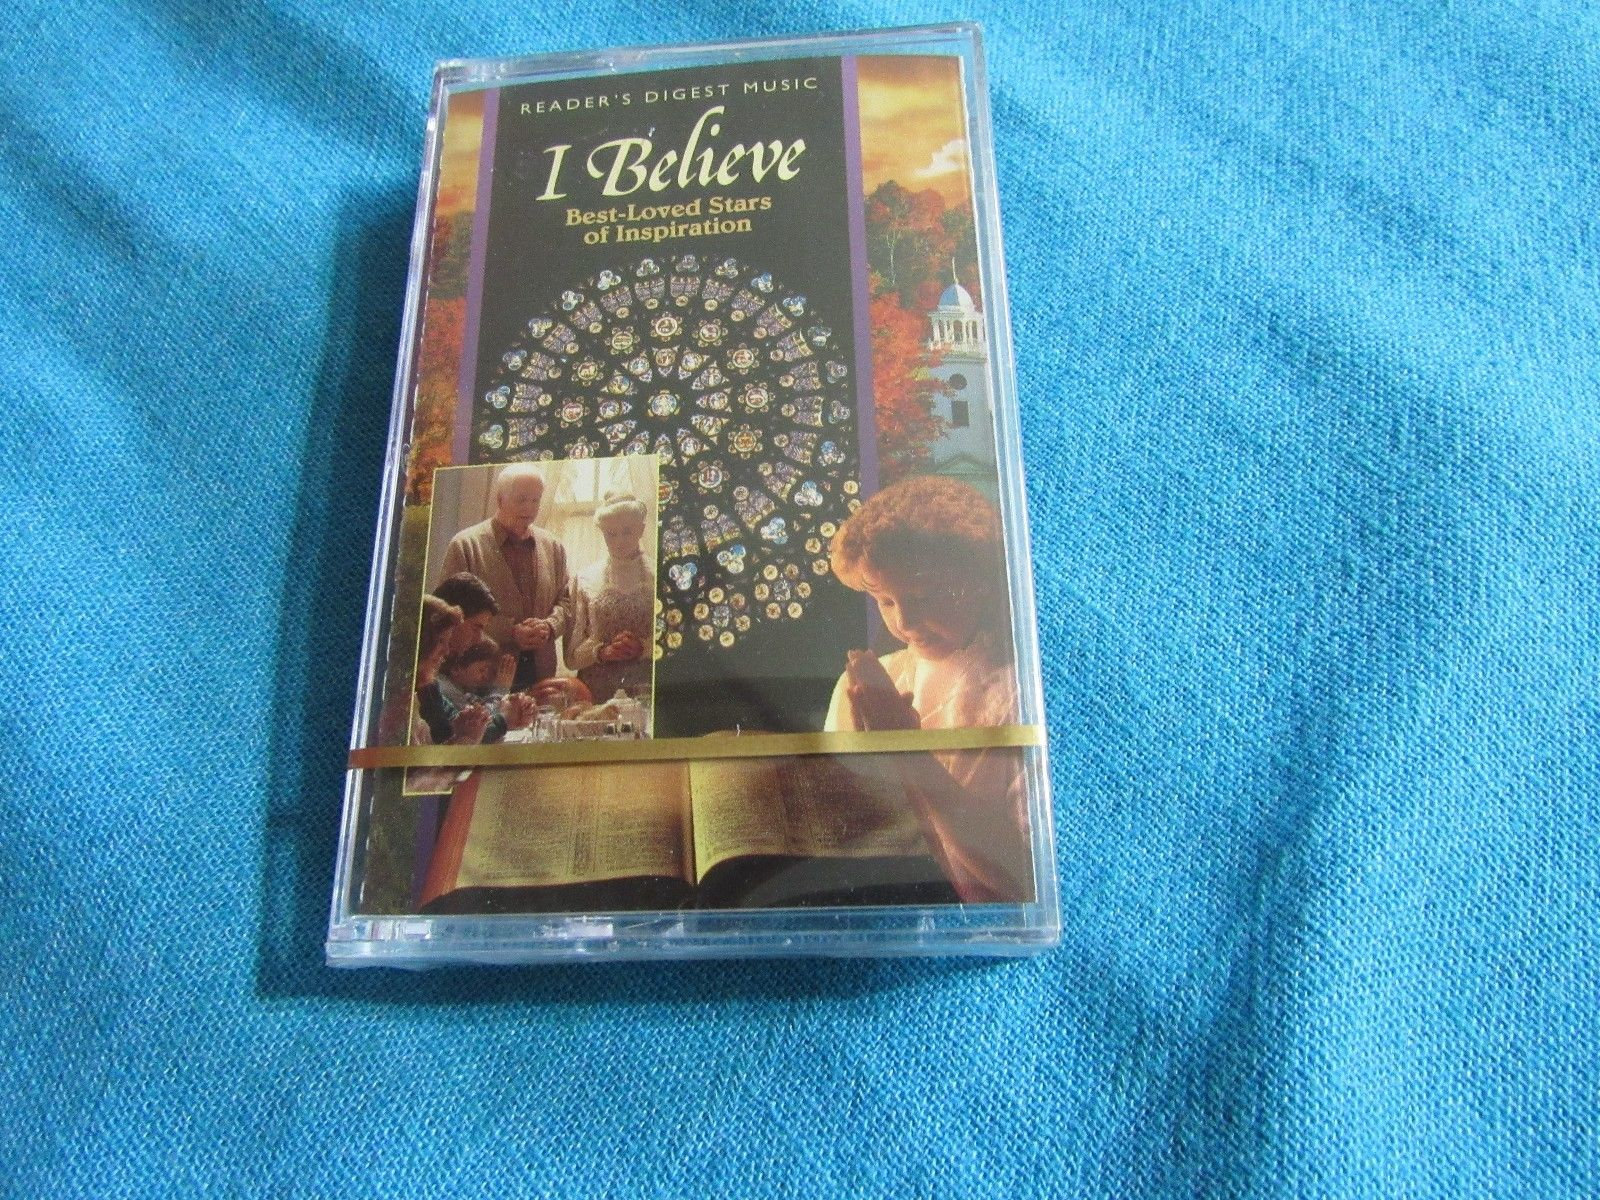 I Believe Best Loved Stars of Inspiration Cassette 4 Tape set Readers Digest NEW